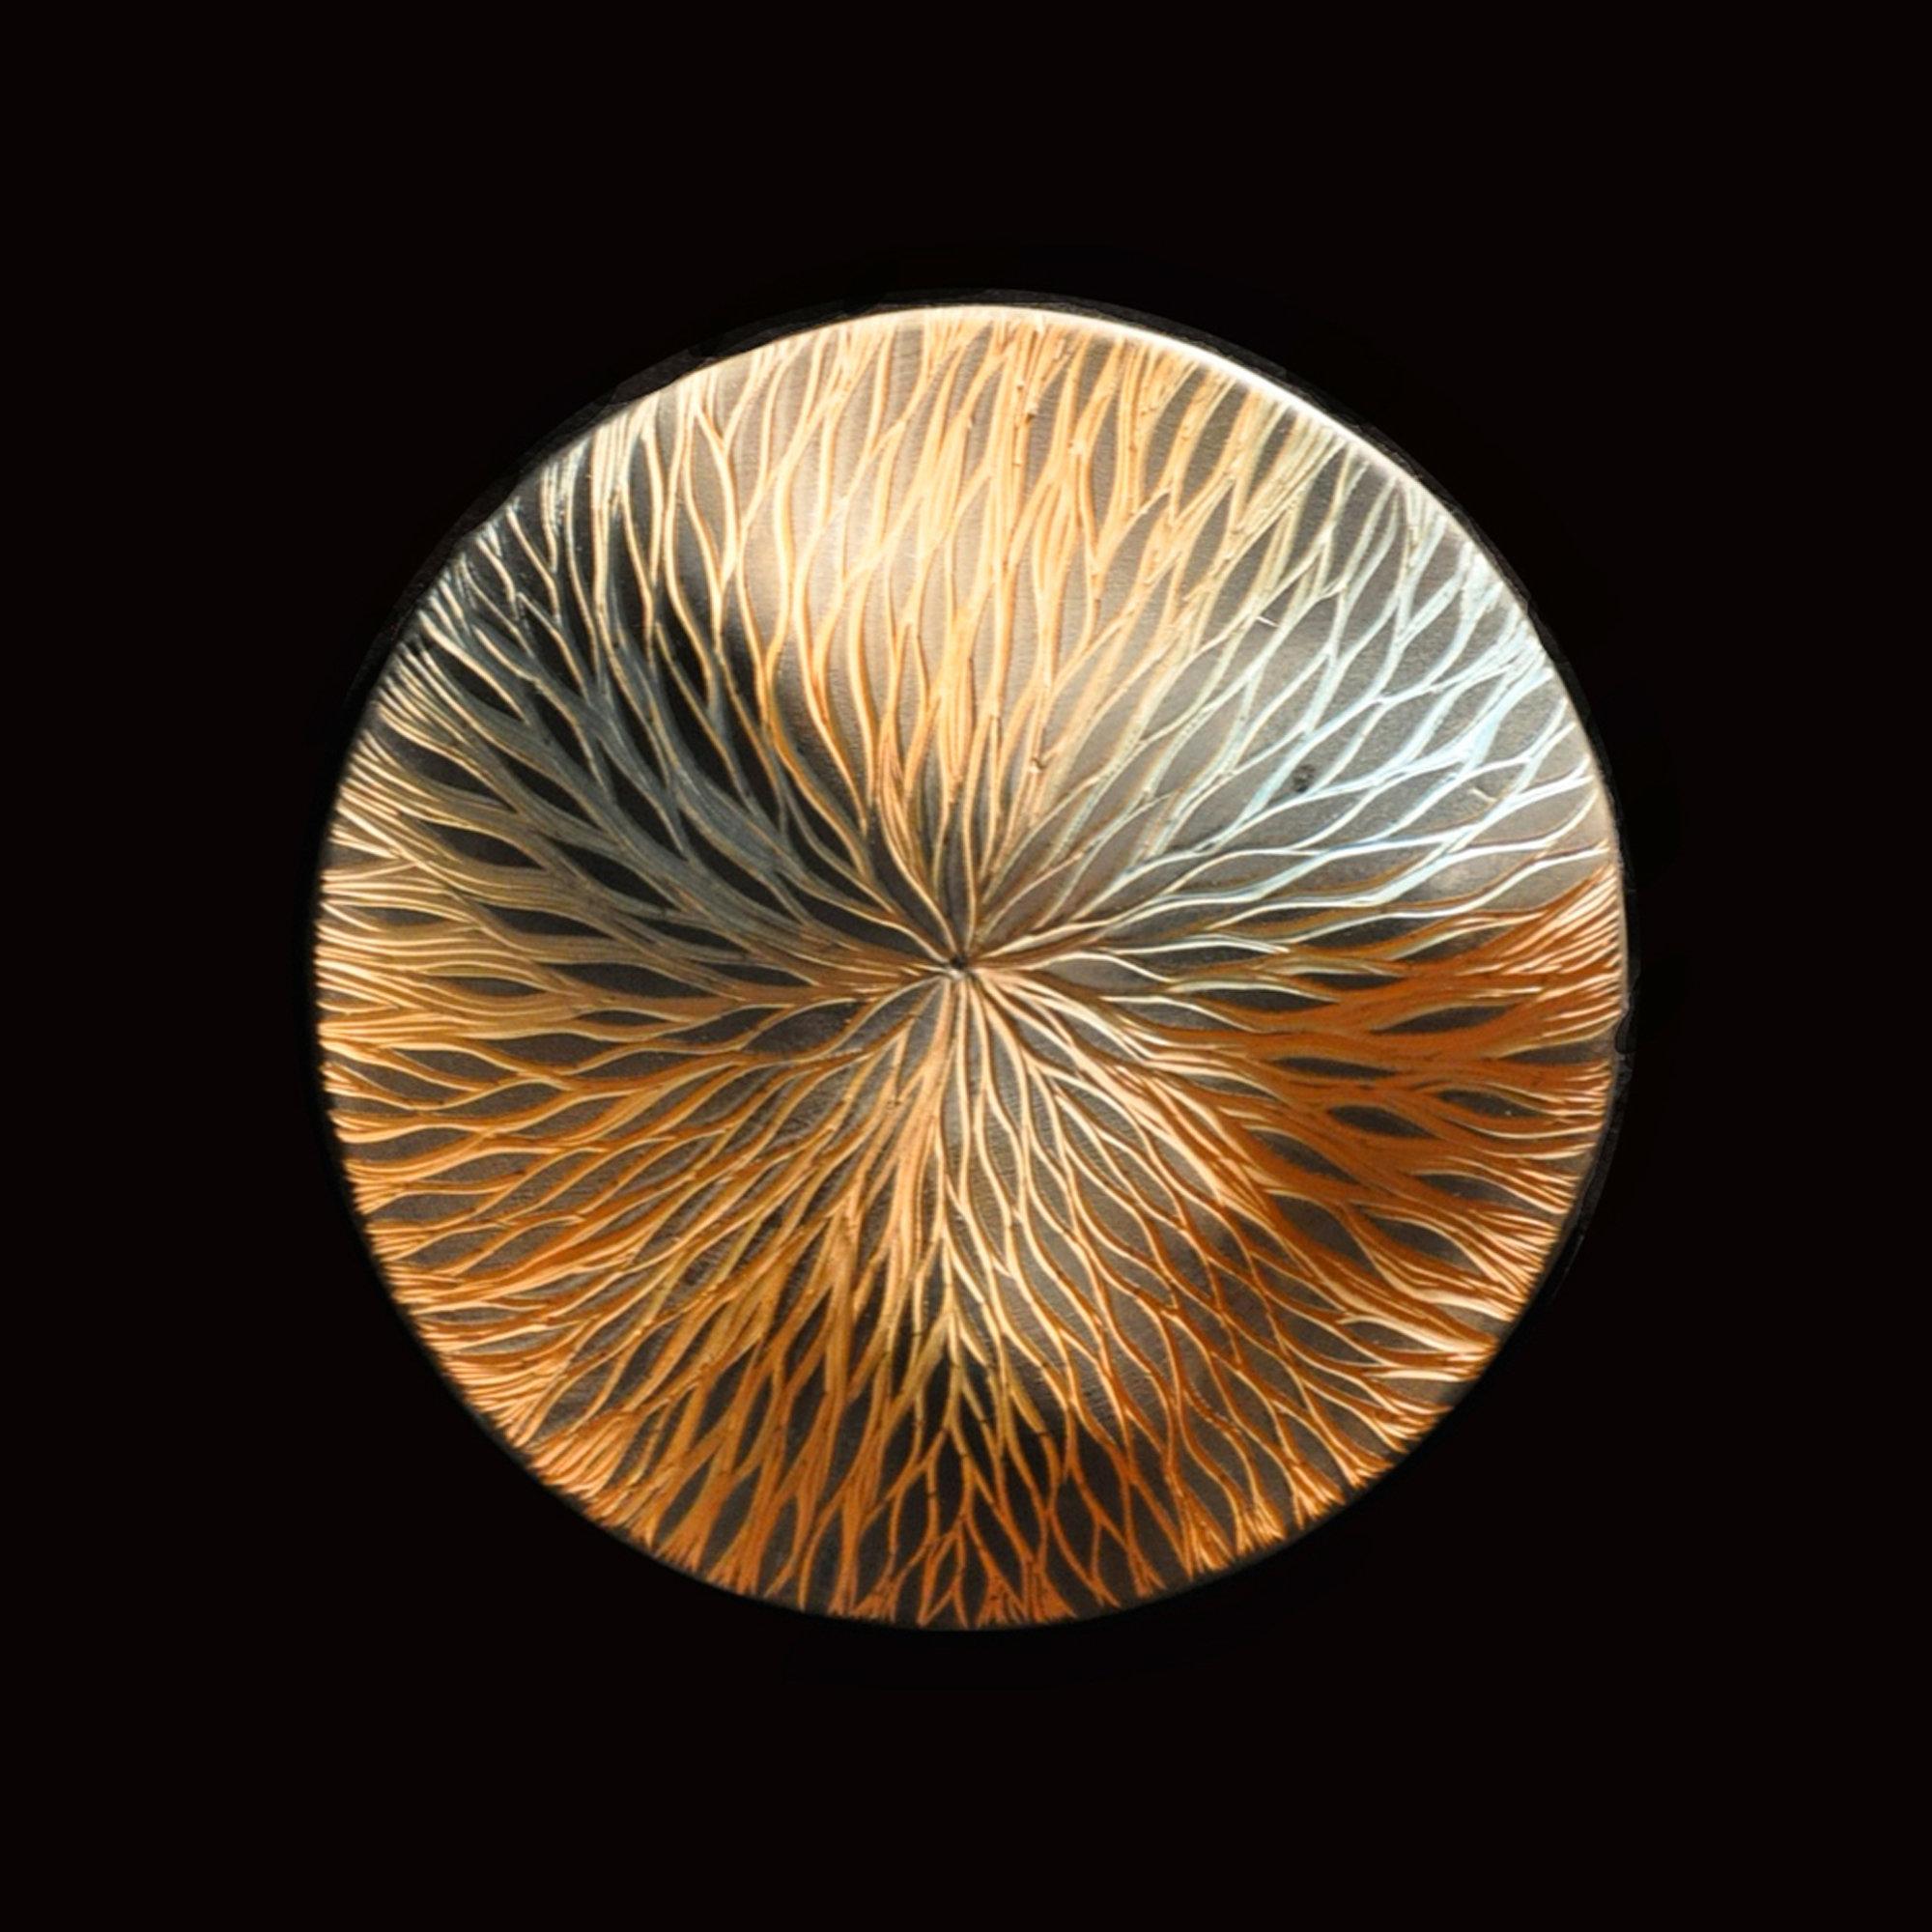 Foliage Wall Disc By Natalie Blake Ceramic Wall Art